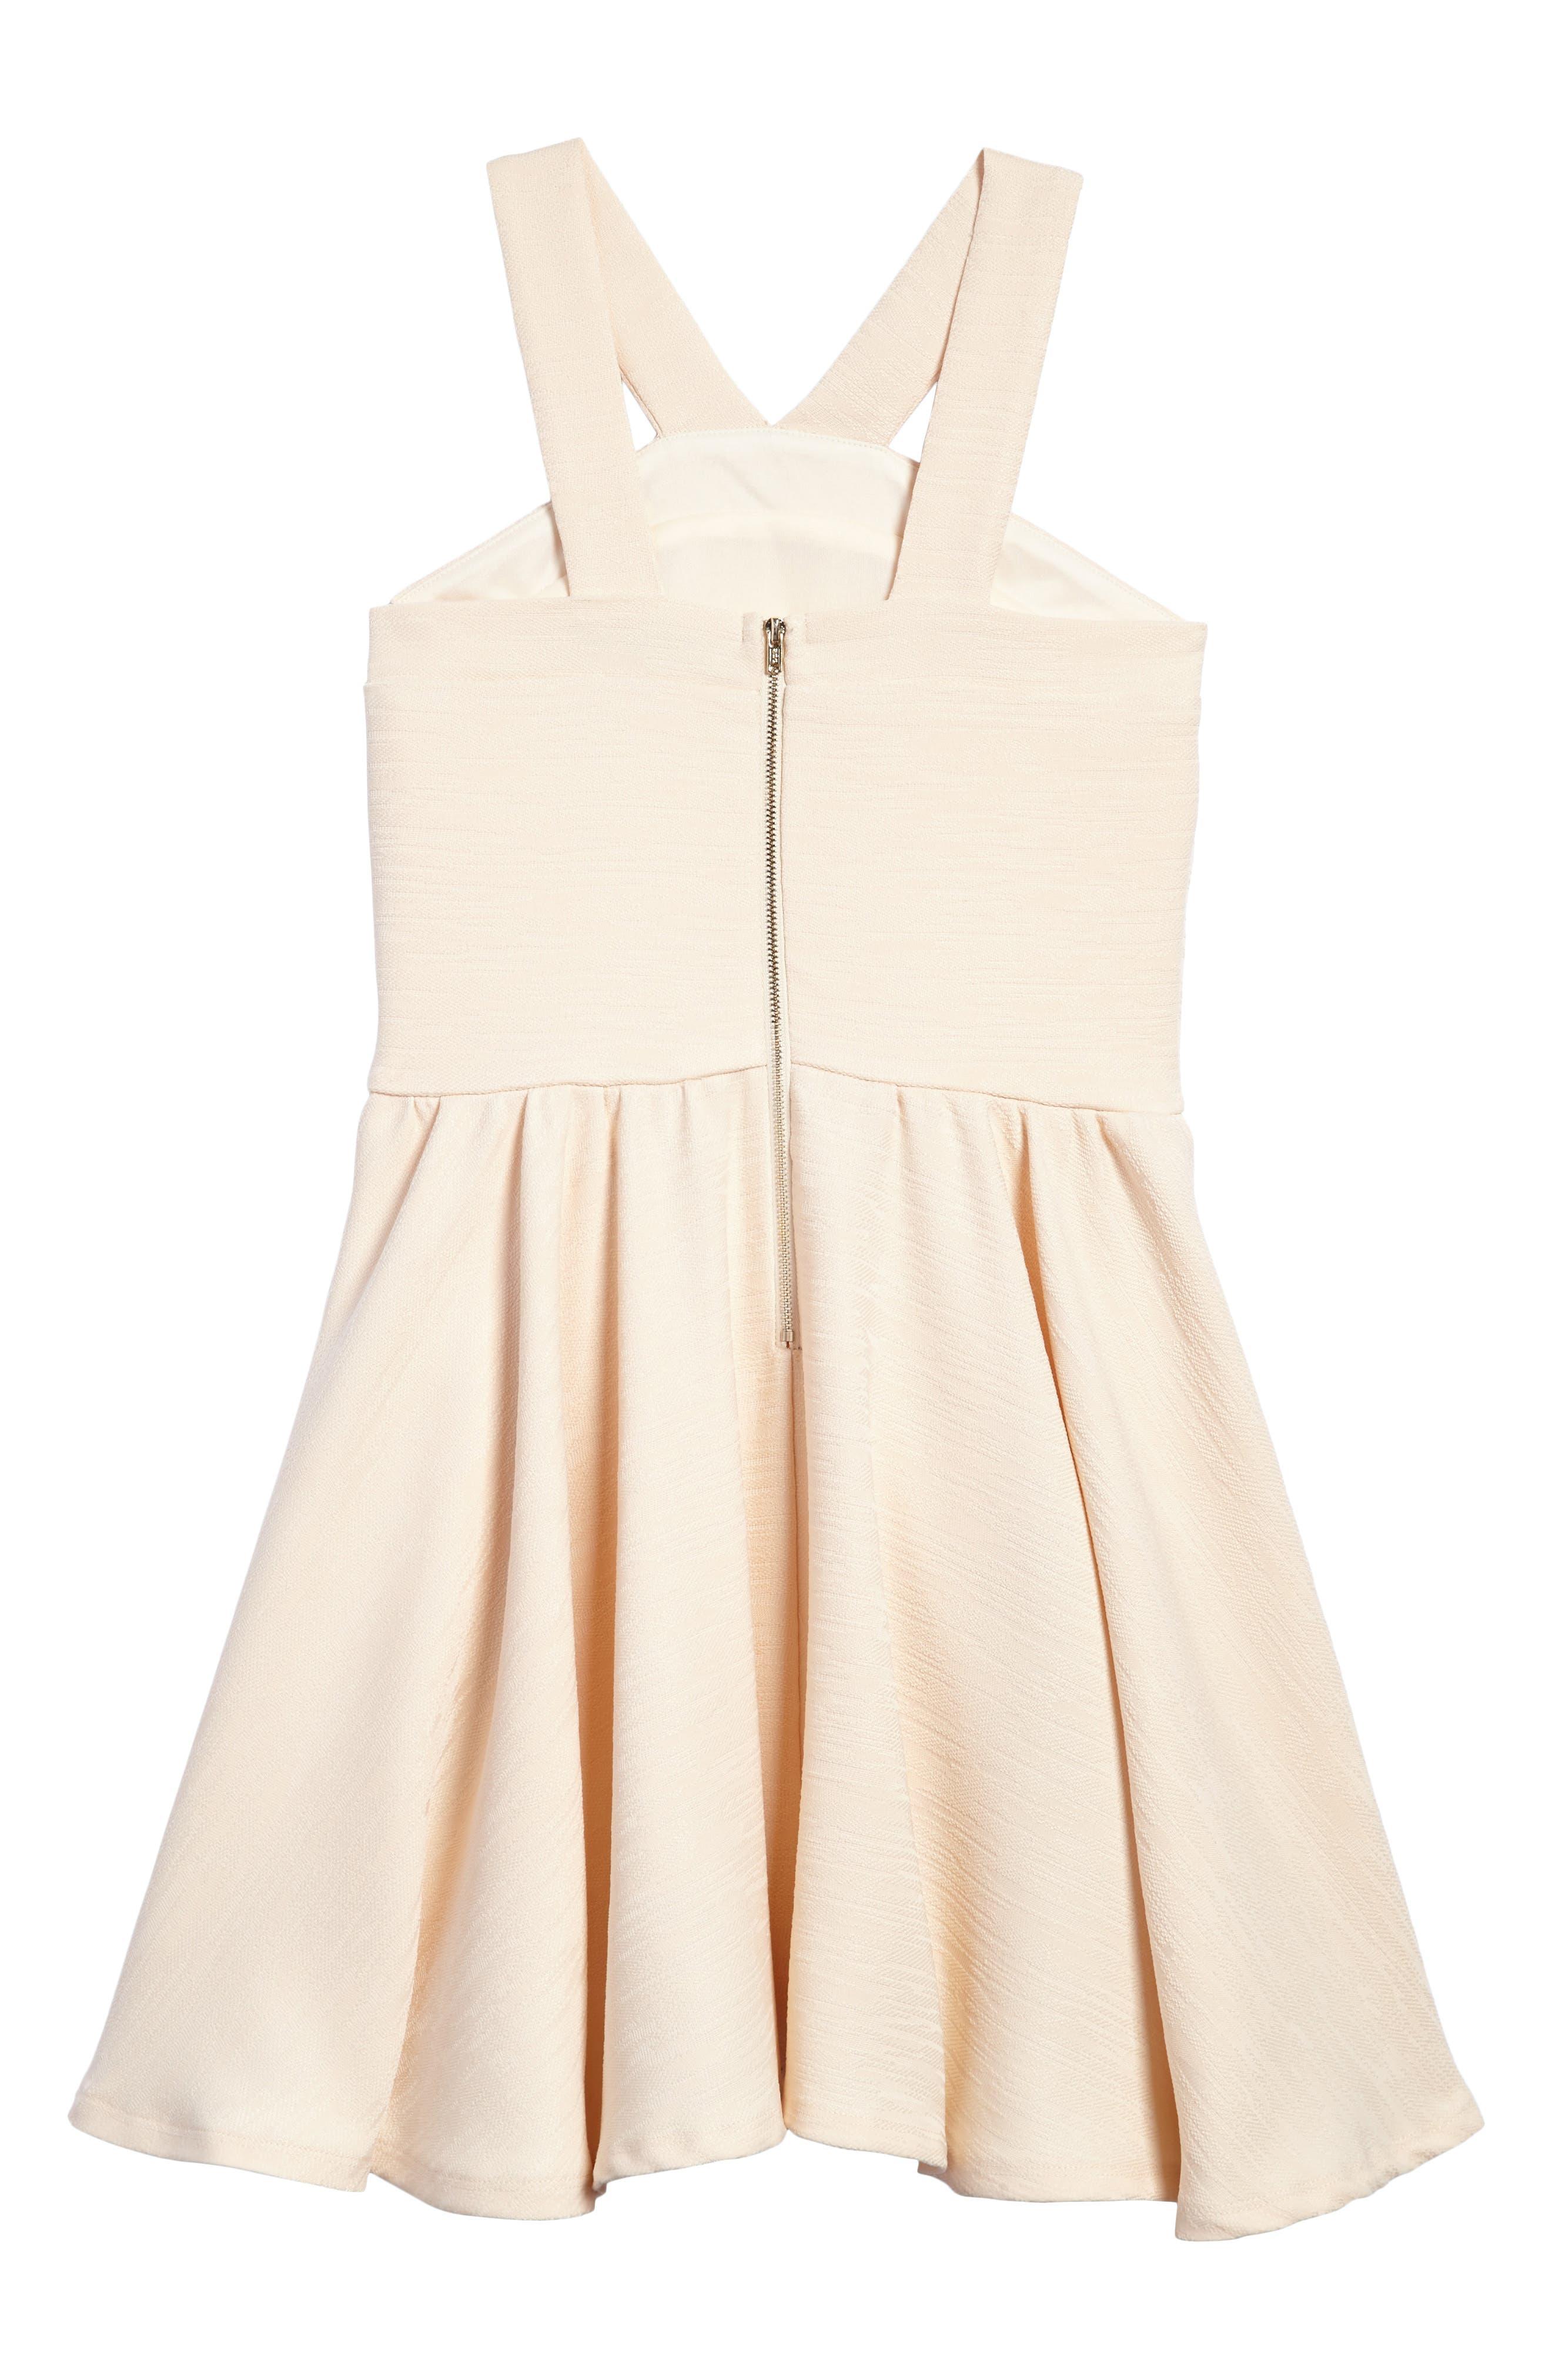 Stephanie Halter Dress,                             Alternate thumbnail 2, color,                             260